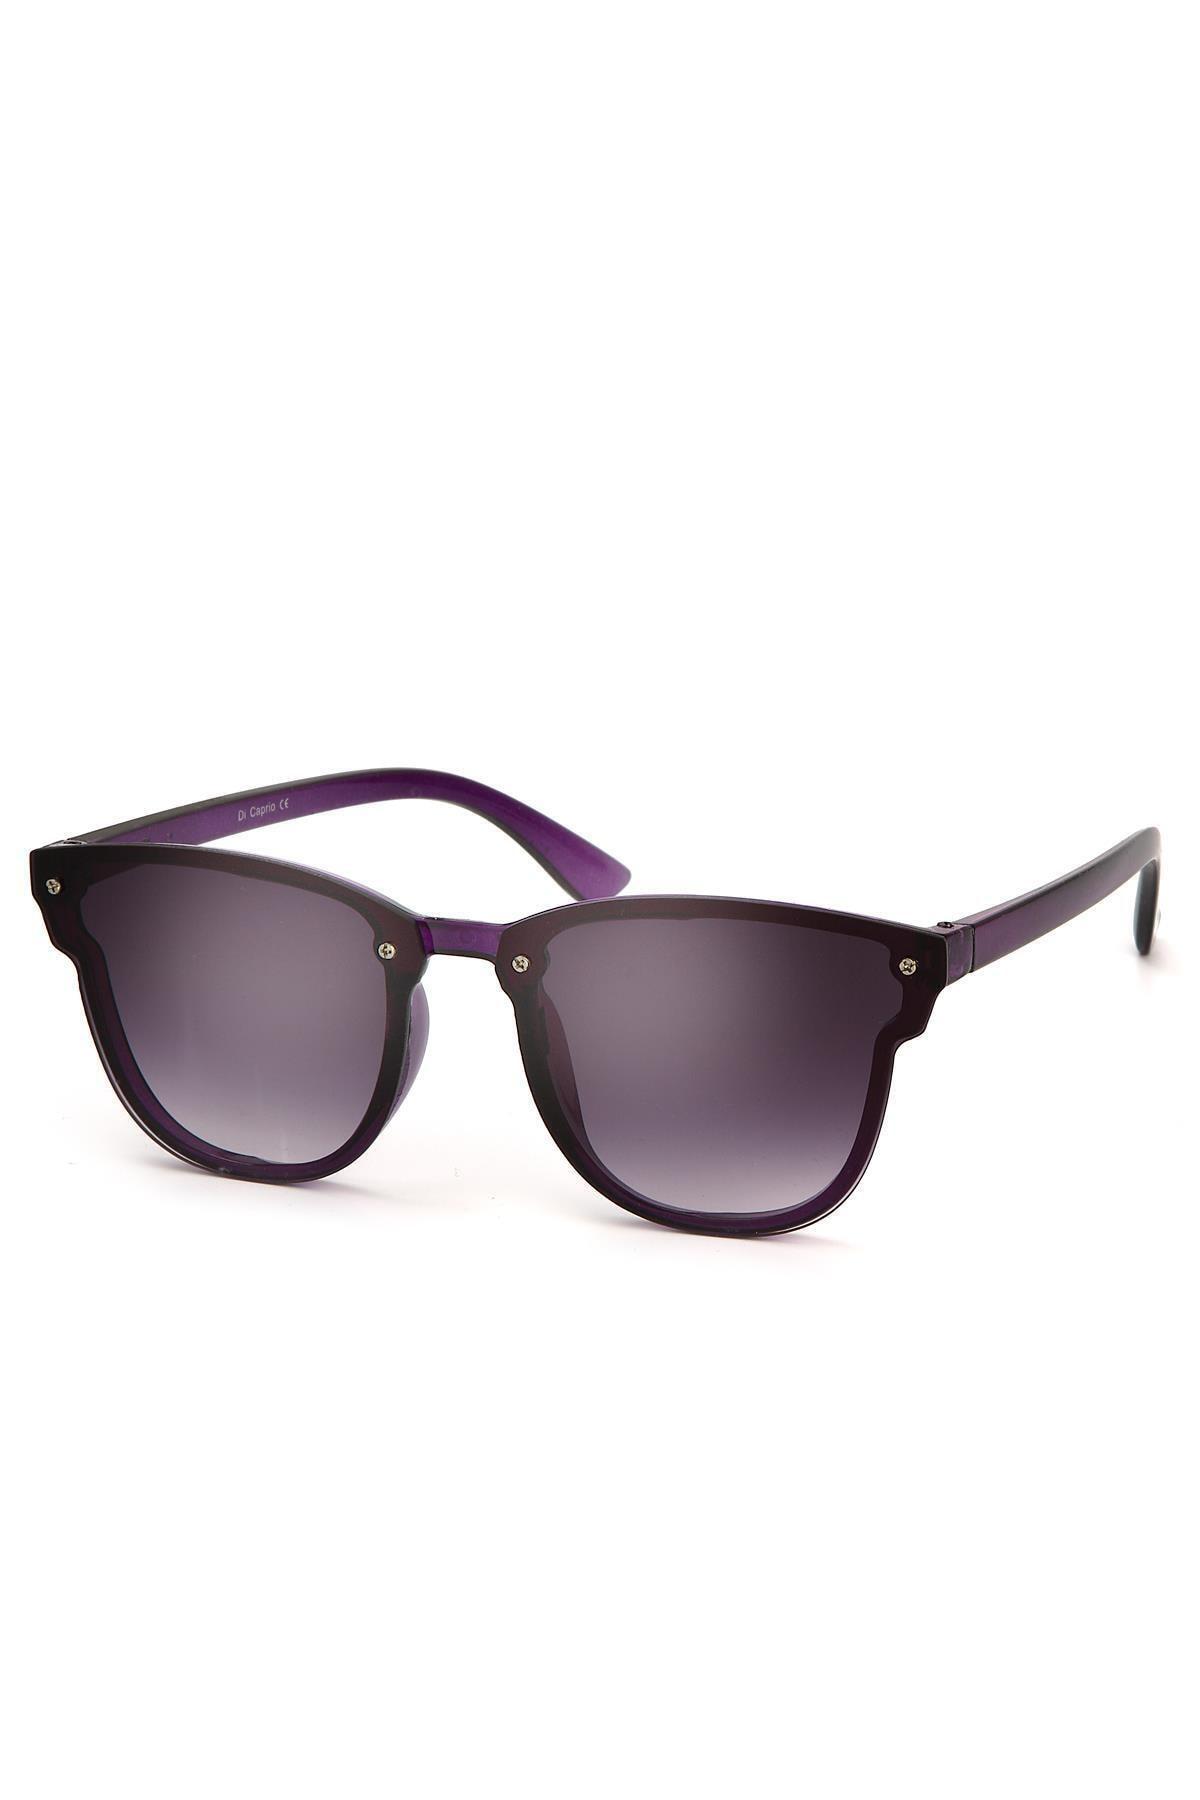 Di Caprio Kadın Oval Güneş Gözlüğü DH1514D 1